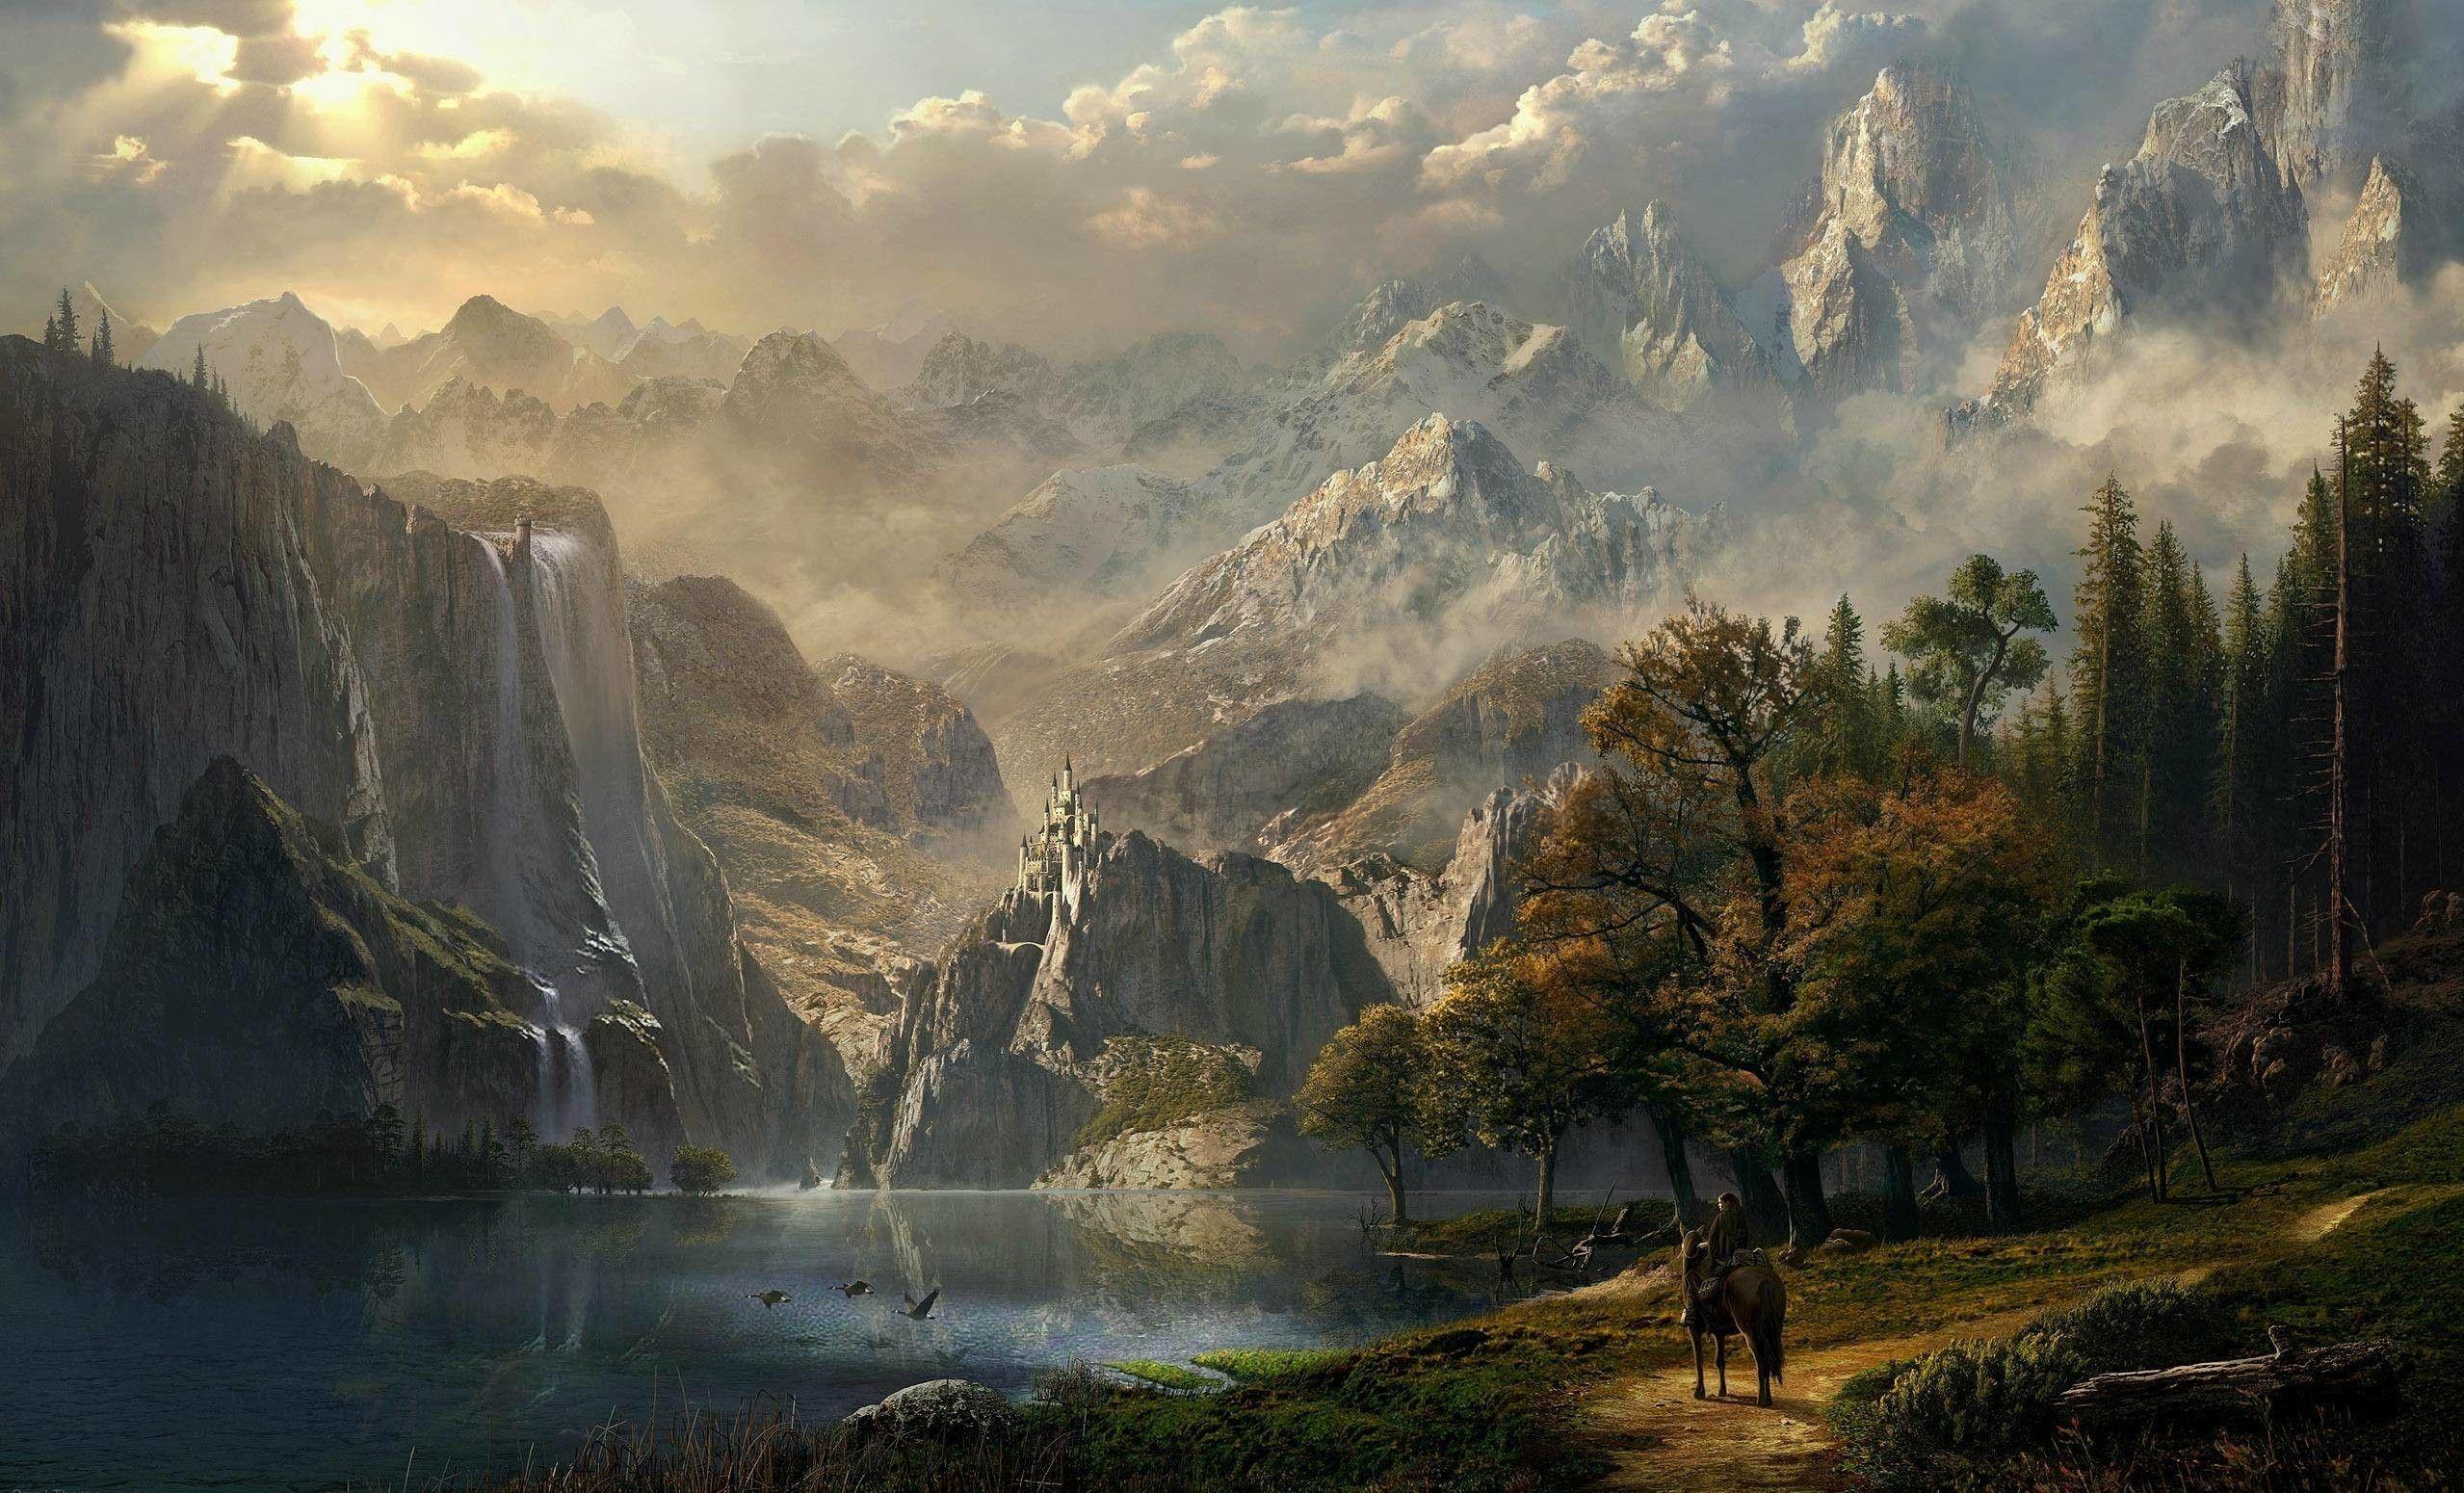 2558x1550 2558x1550 Epic Fantasy Landscape Wallpaper Vergapipe Fantasy Landscape Fantasy Art Landscapes Landscape Wallpaper